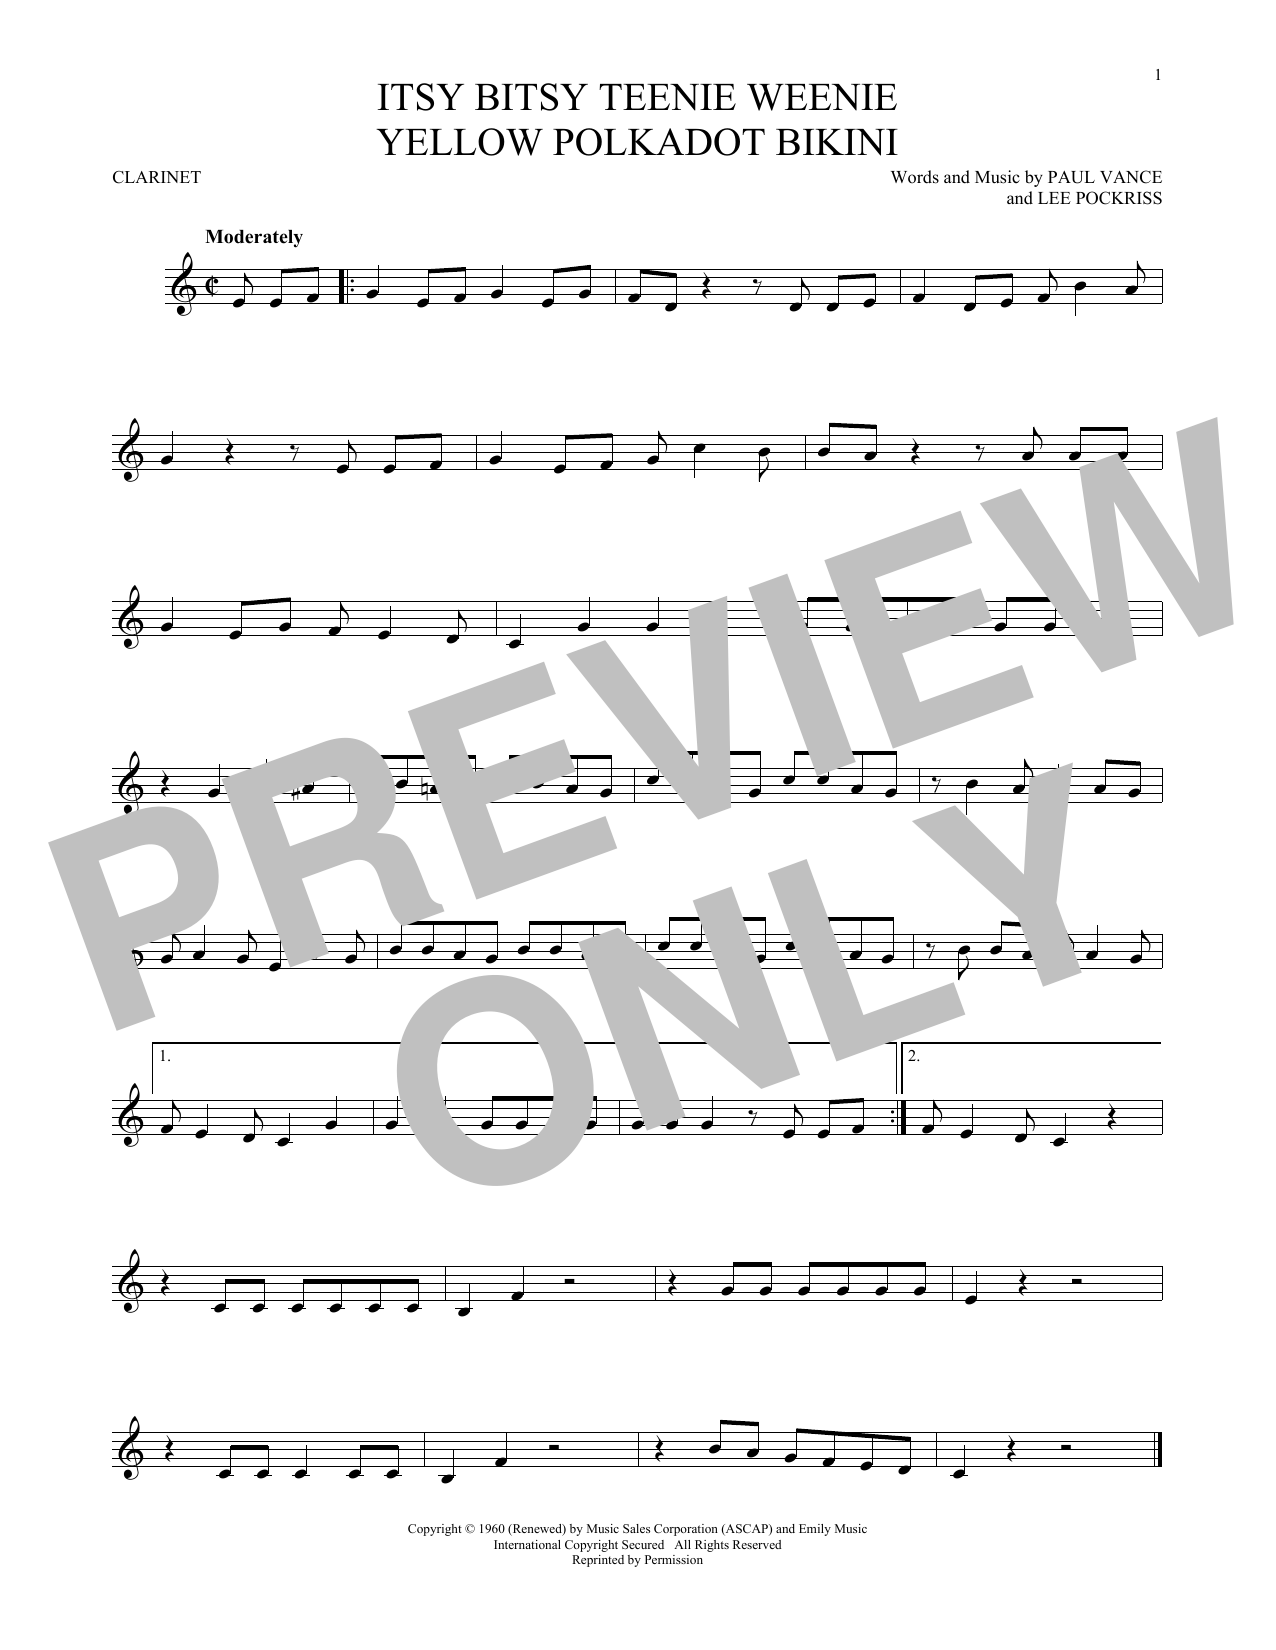 Itsy Bitsy Teenie Weenie Yellow Polkadot Bikini (Clarinet Solo)